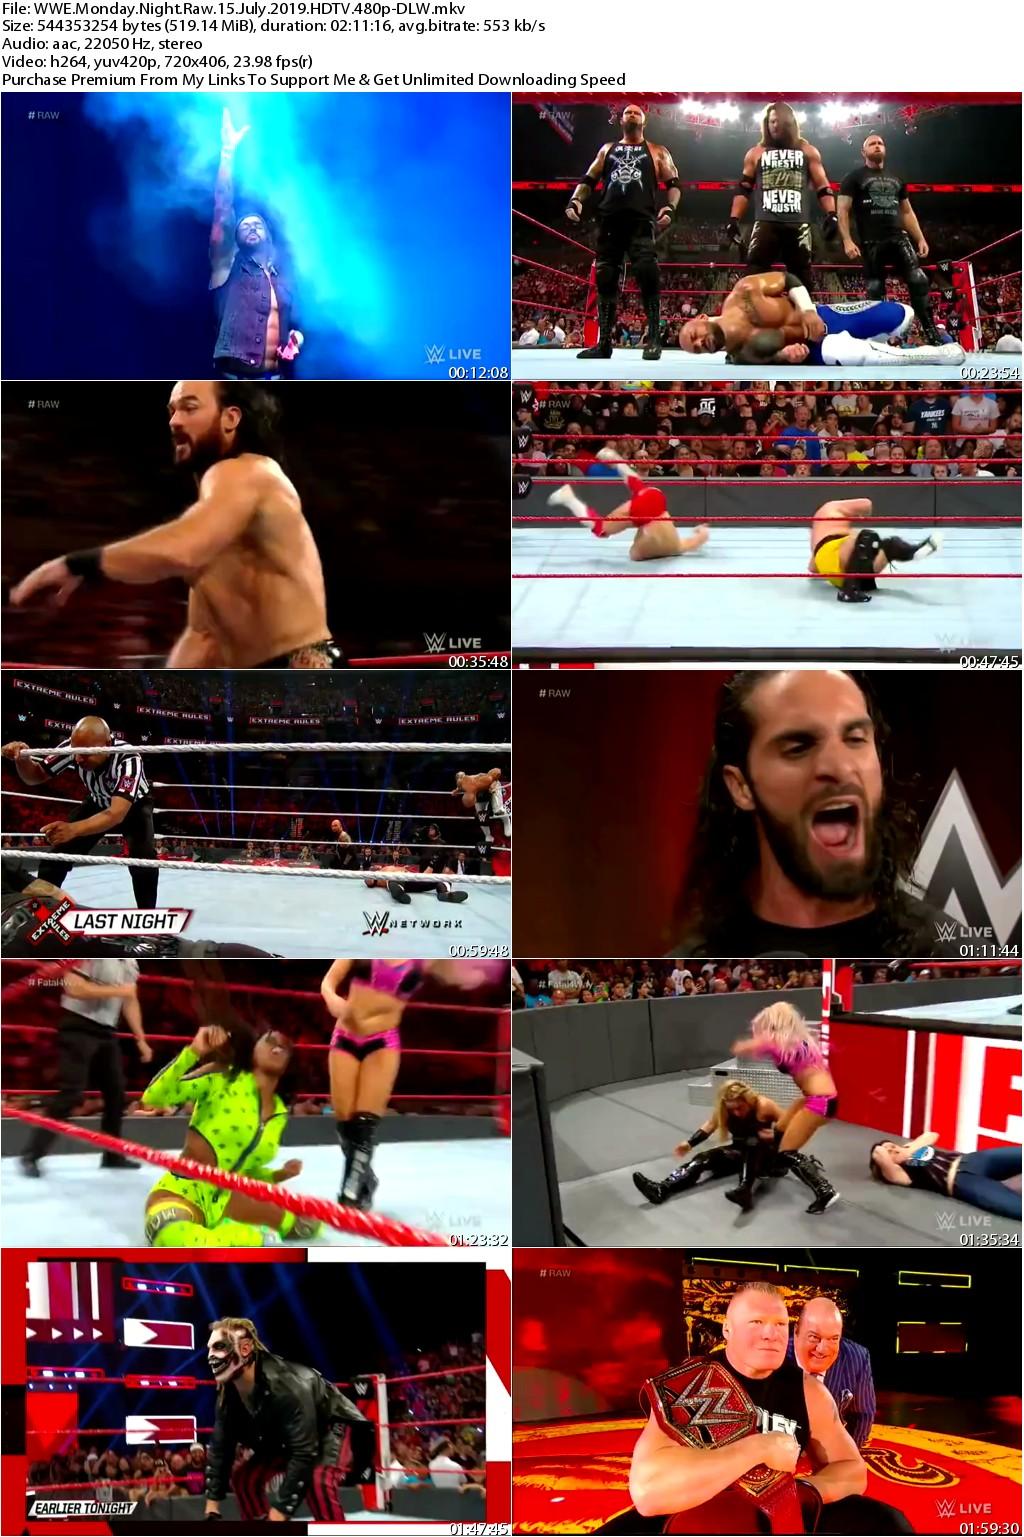 WWE Monday Night Raw 15 July 2019 HDTV 480p-DLW